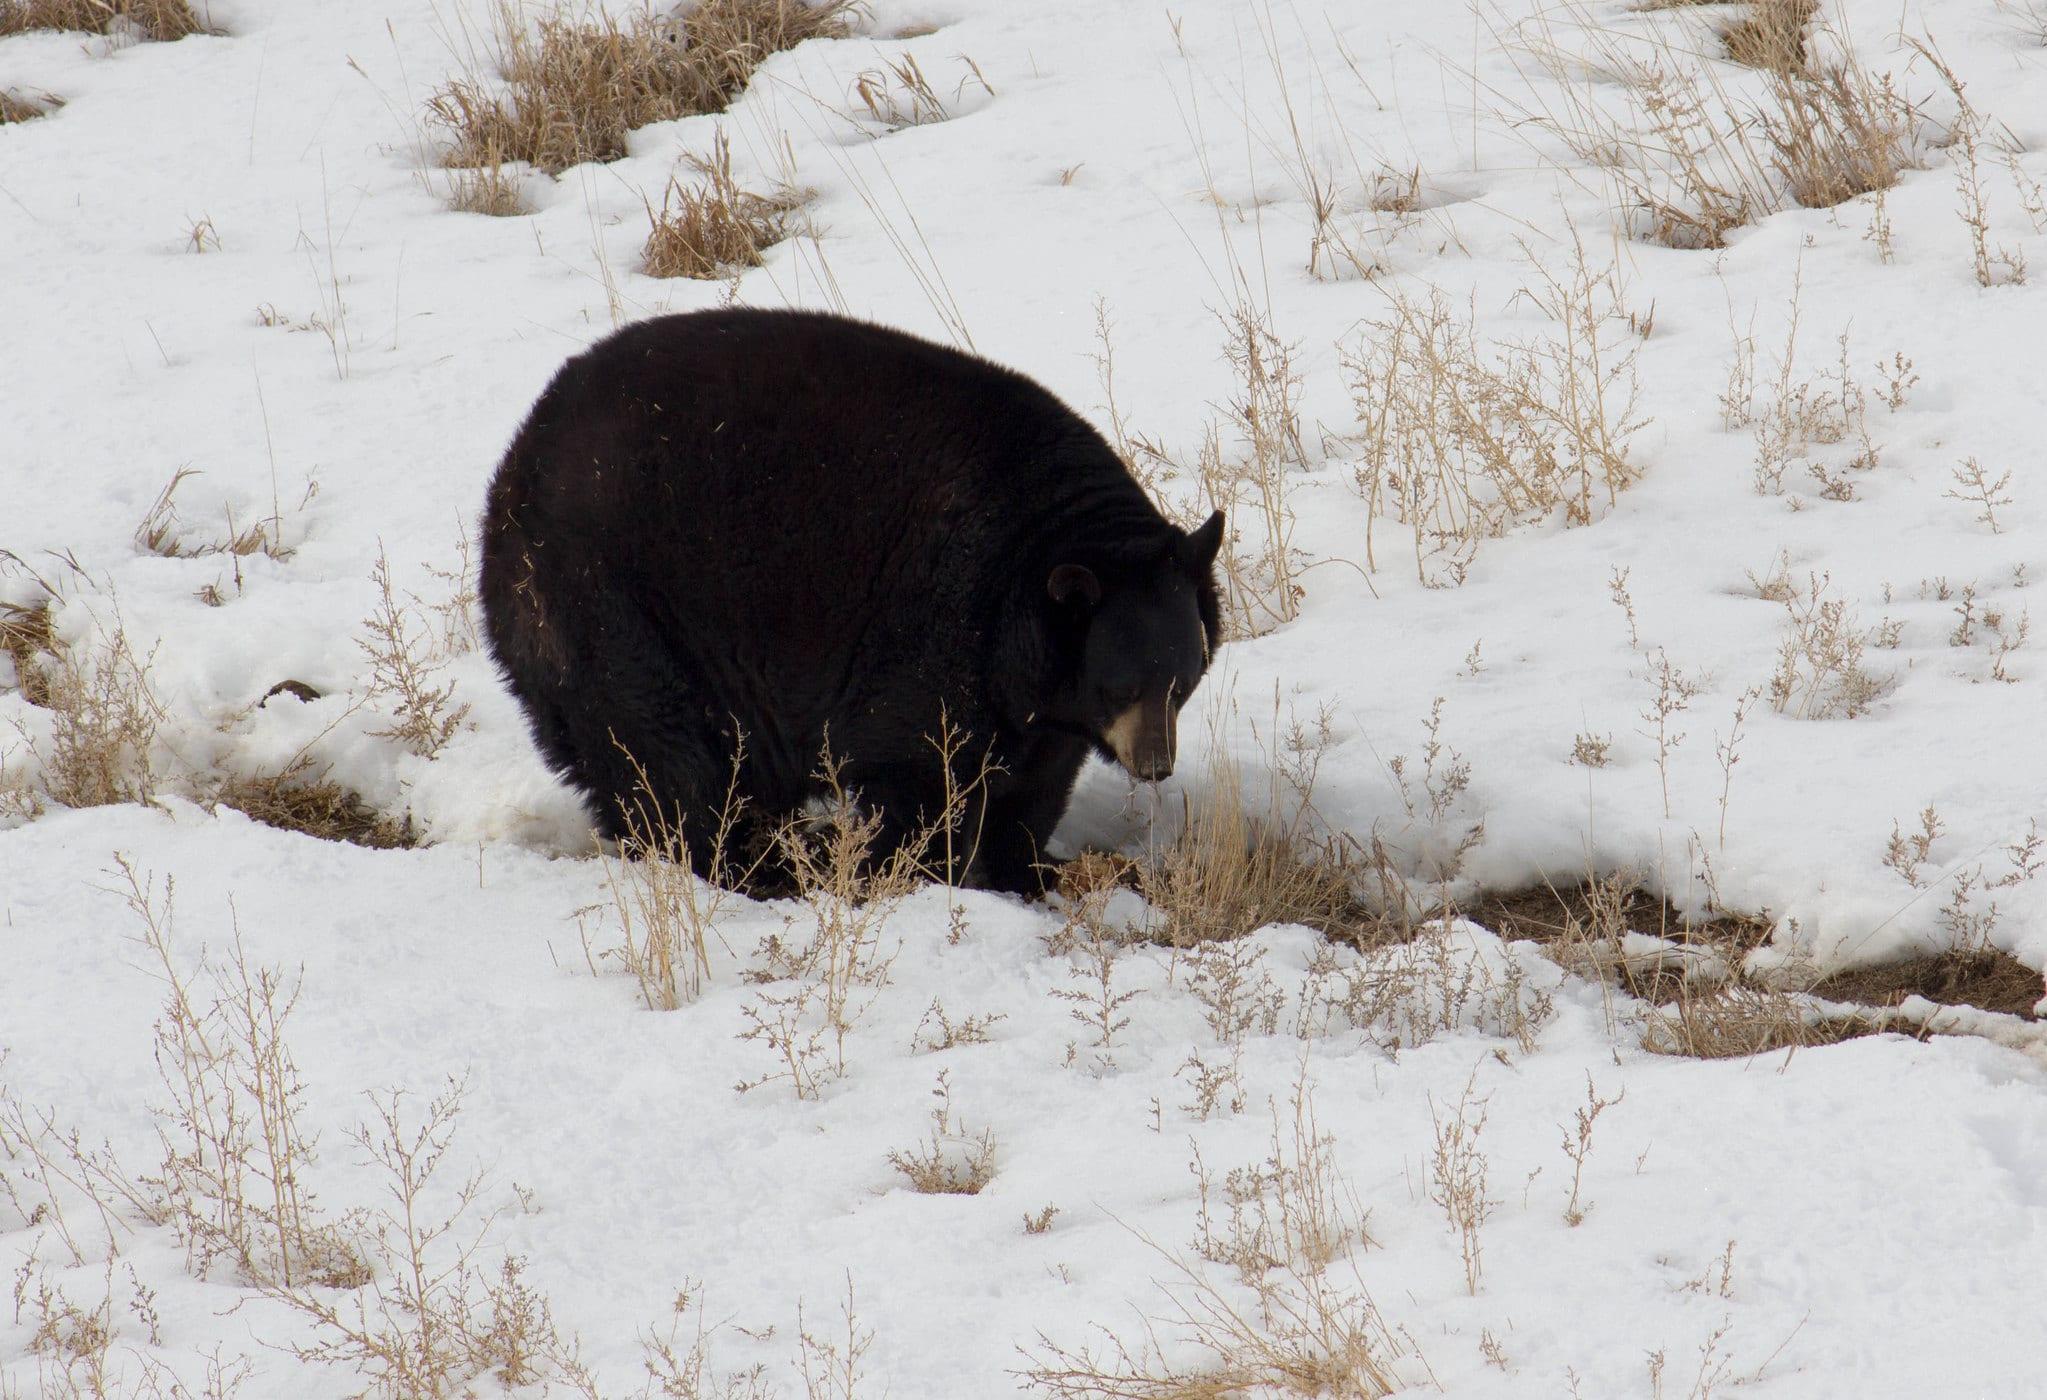 image of a black bear at wild animal sanctuary